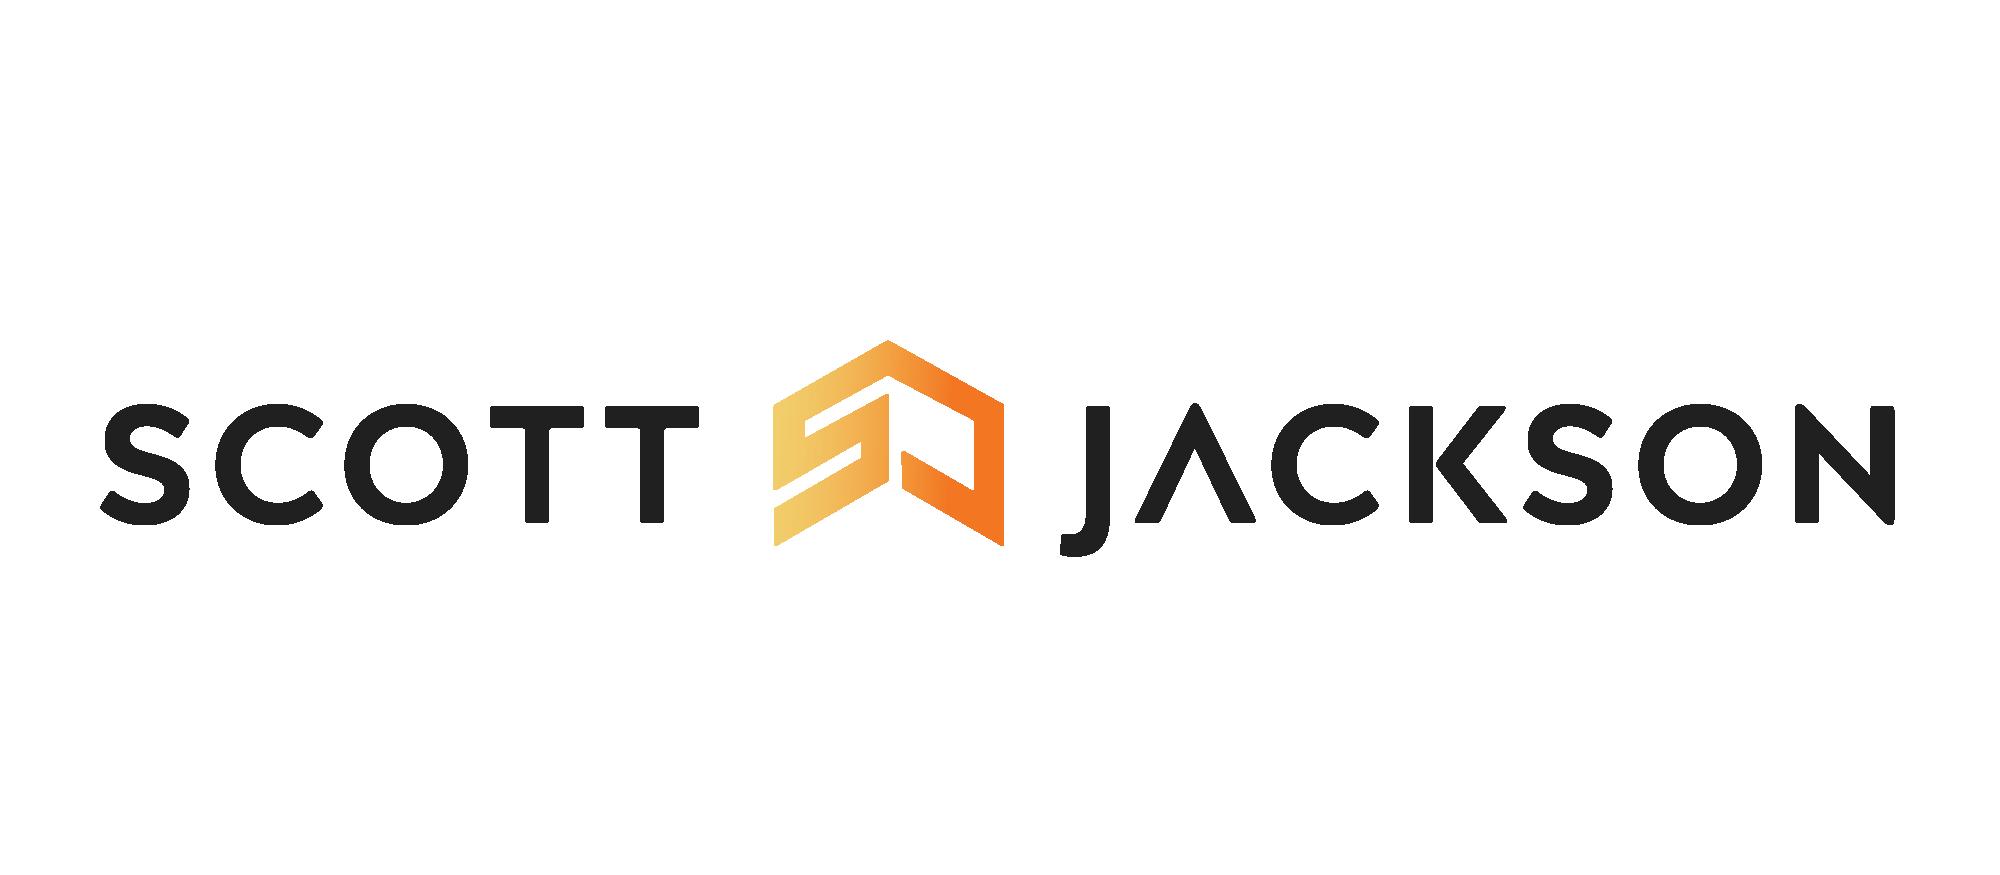 Scott Jackson